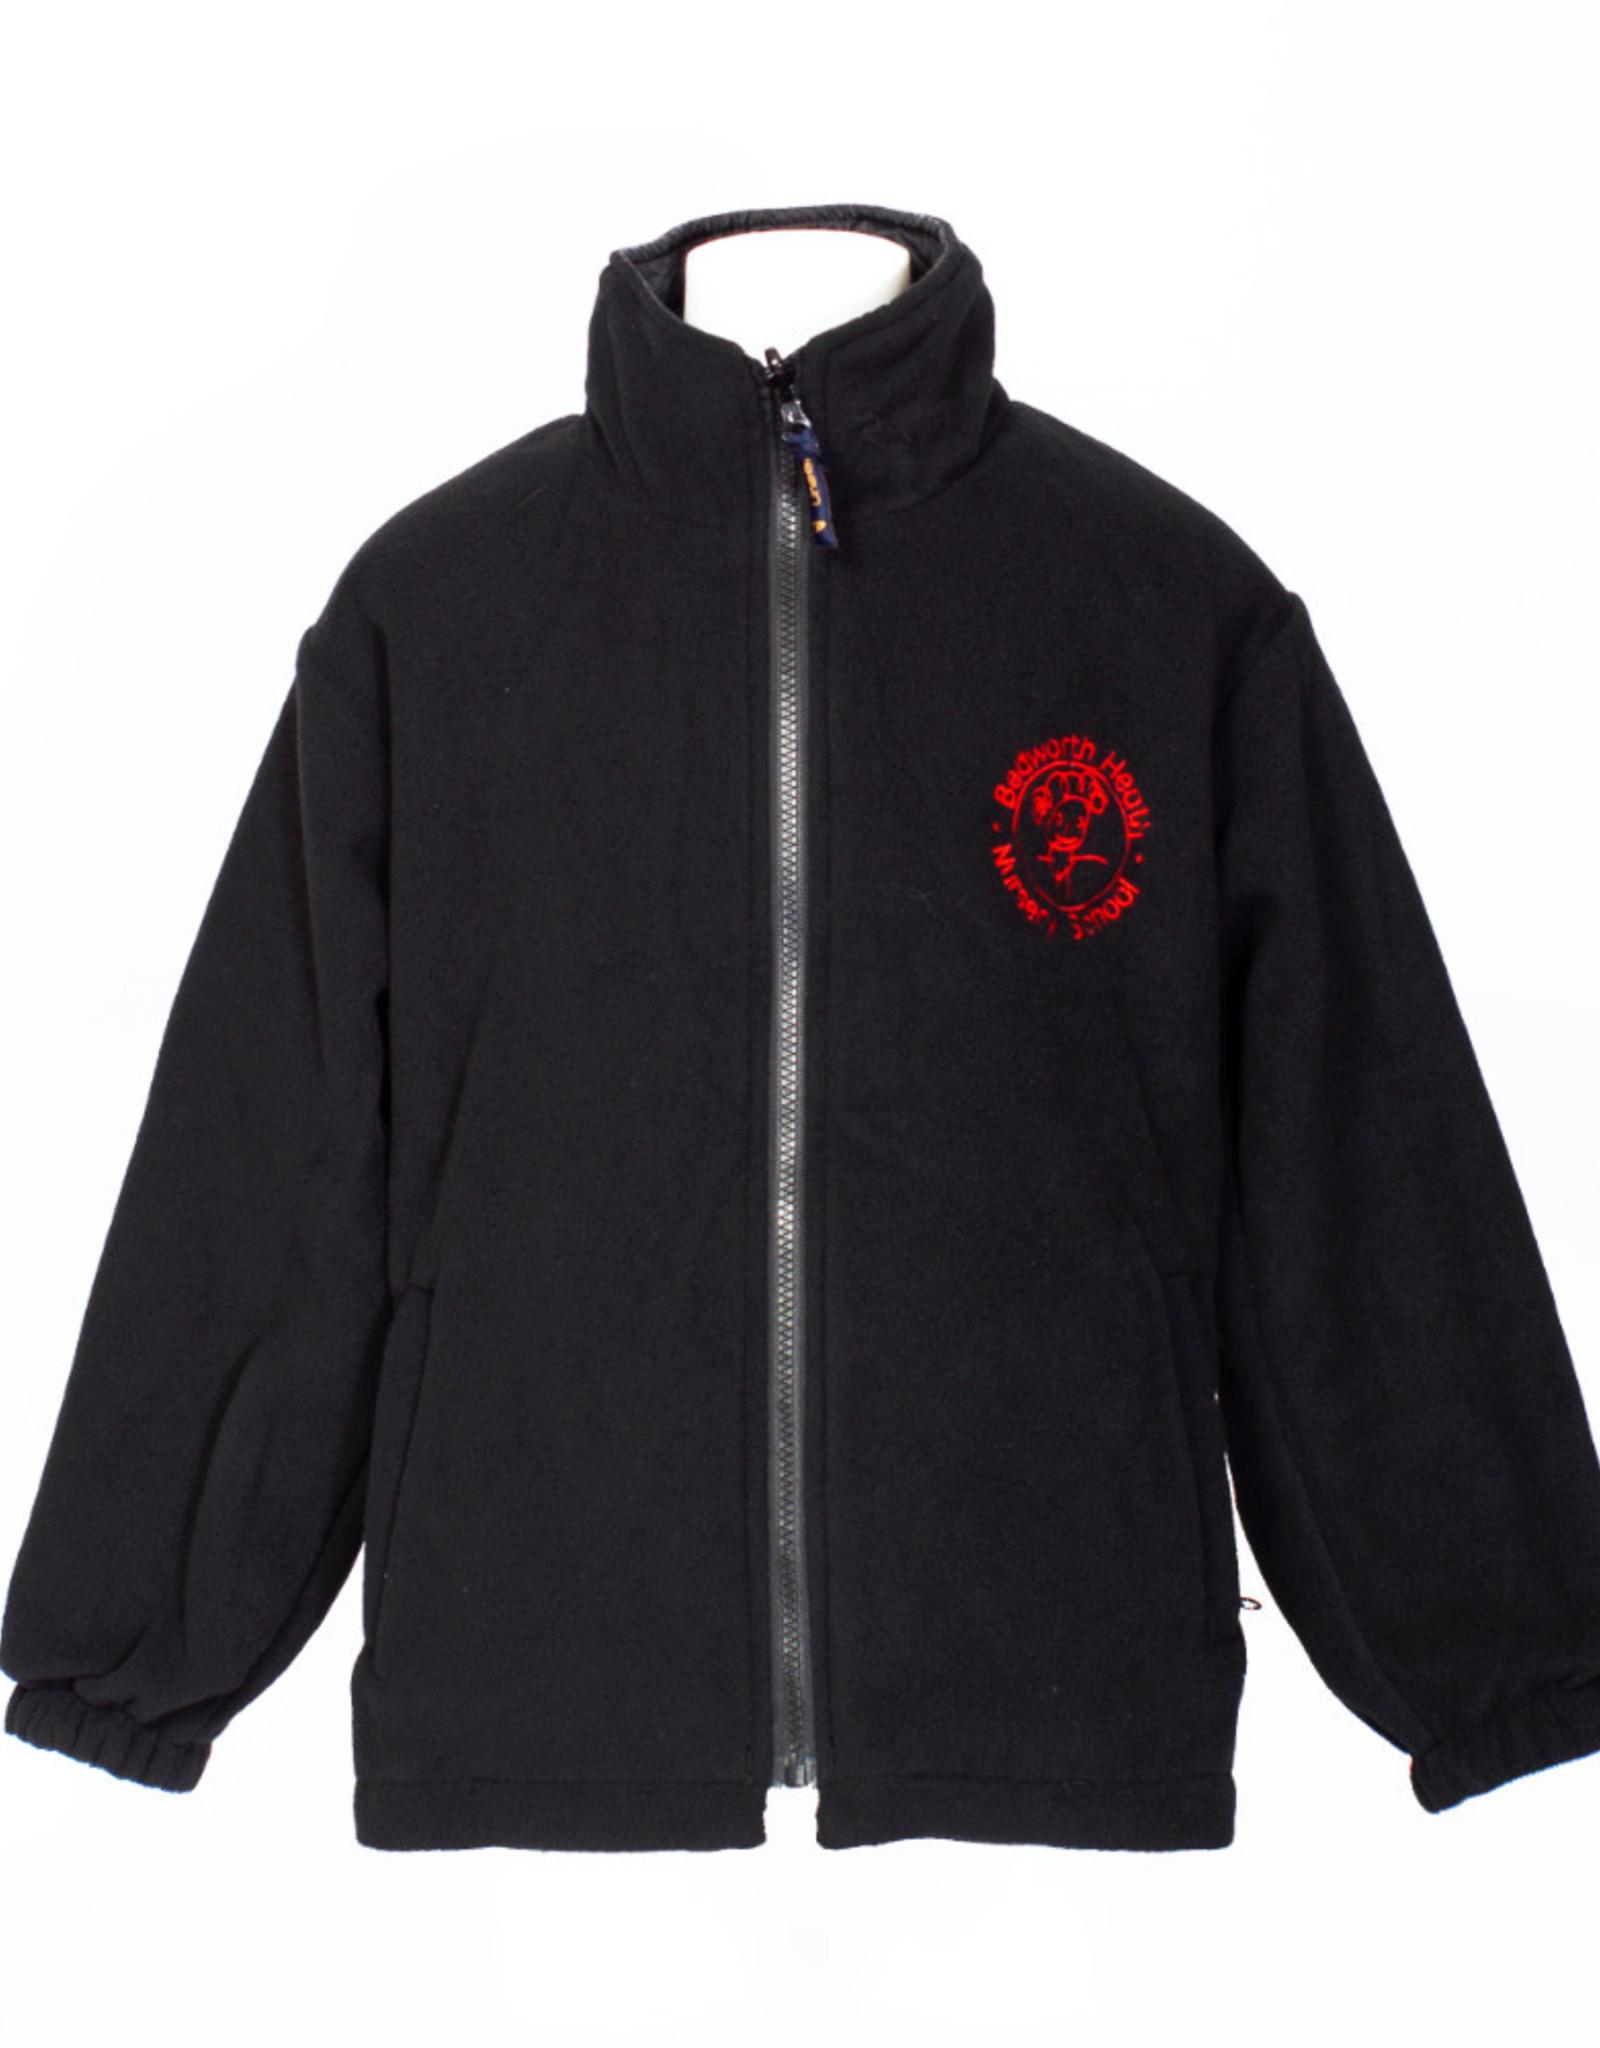 Reversible Jacket Child Size - Bedworth Heath Nursey School